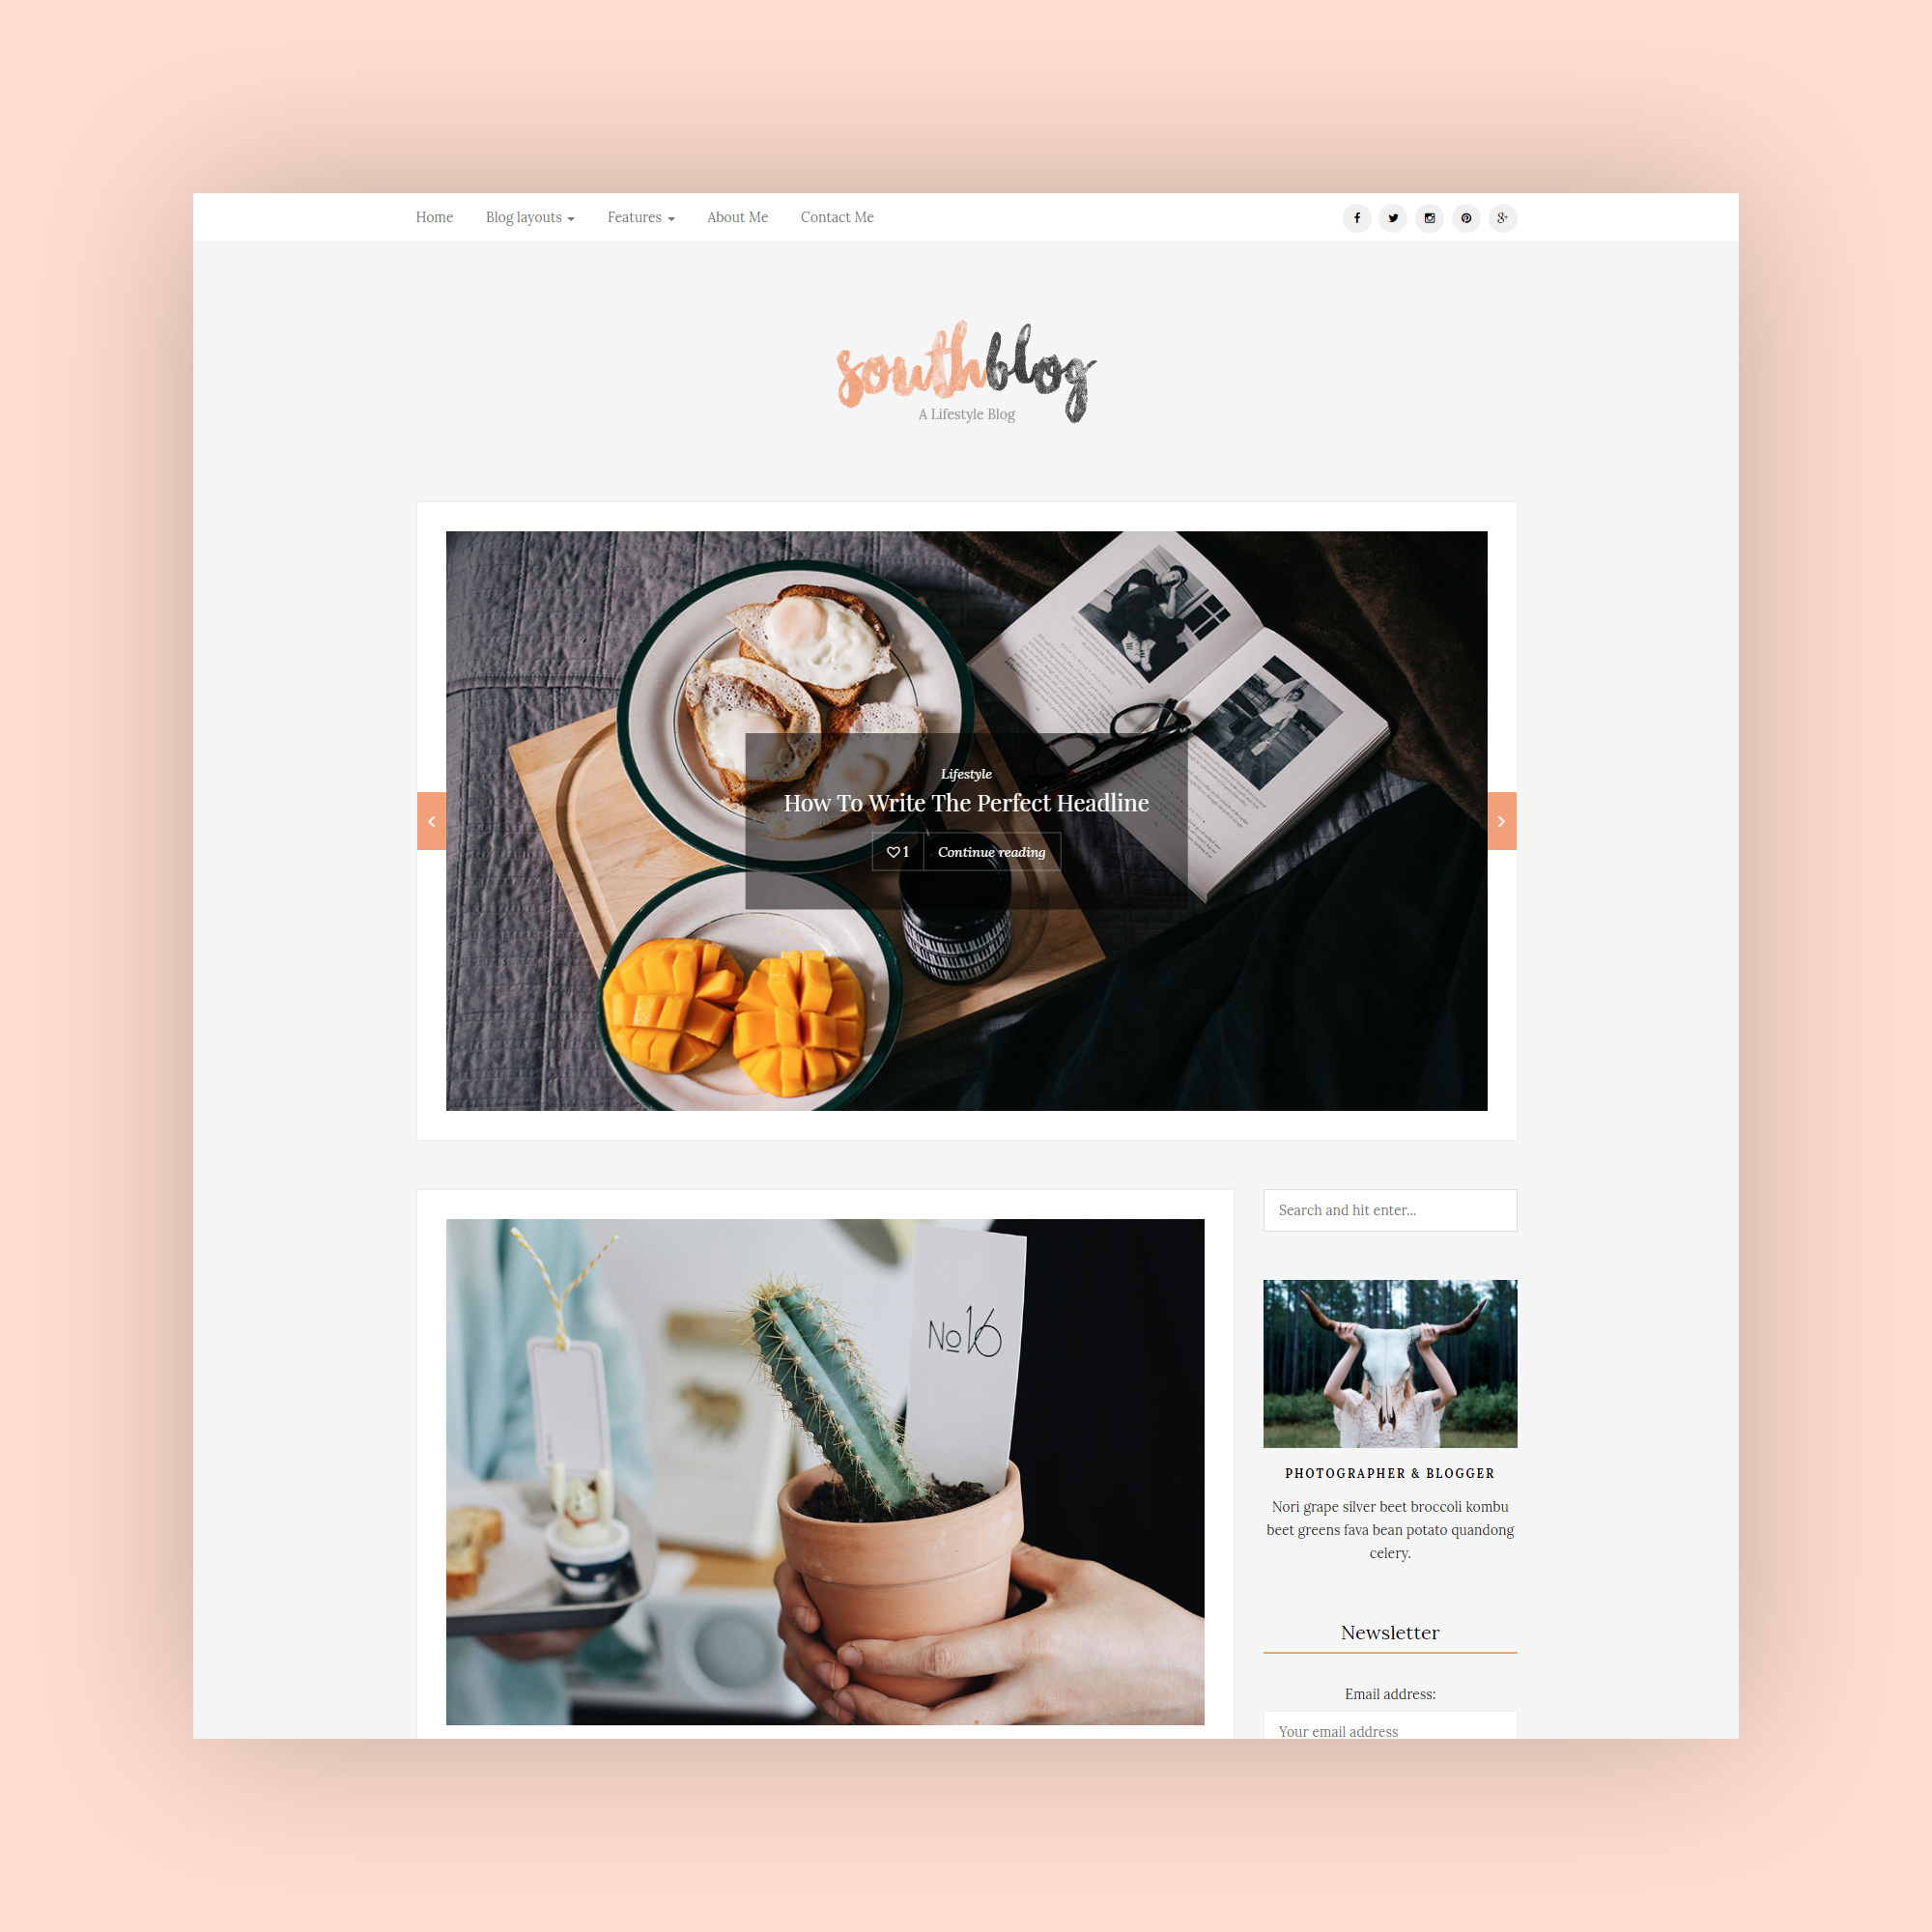 SouthBlog - Minimal and Modern Blog WordPress Theme